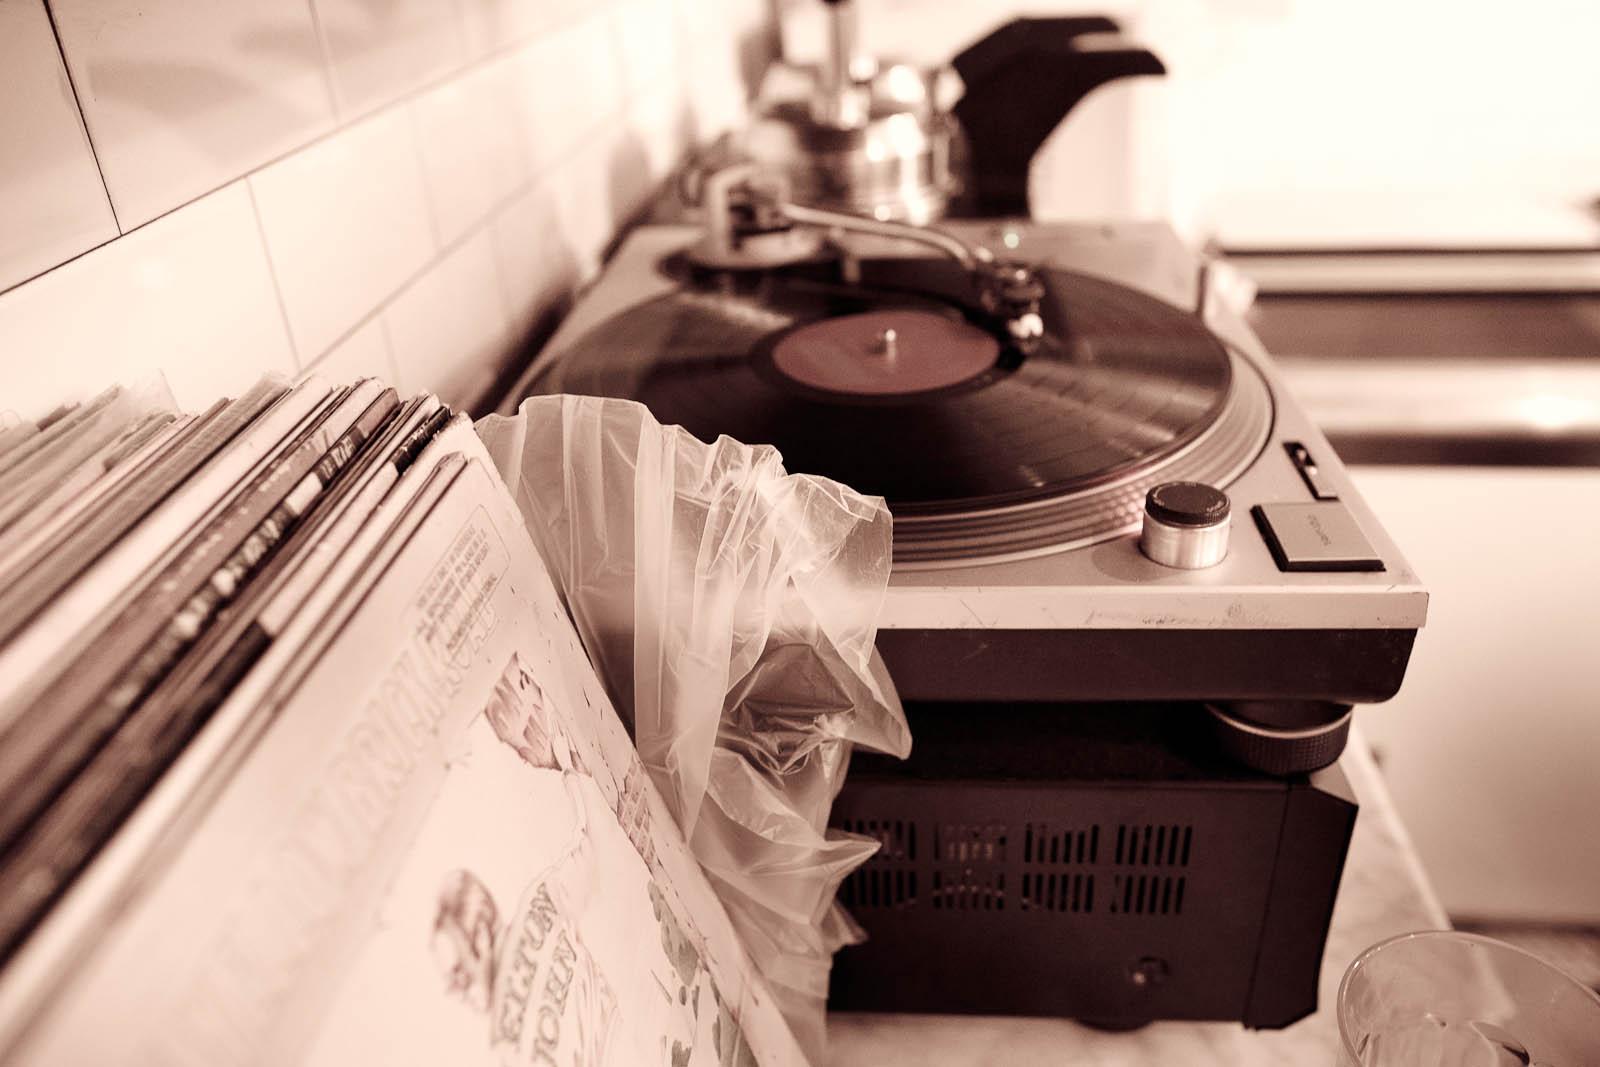 Analog. Technics 1200s with vintage records.